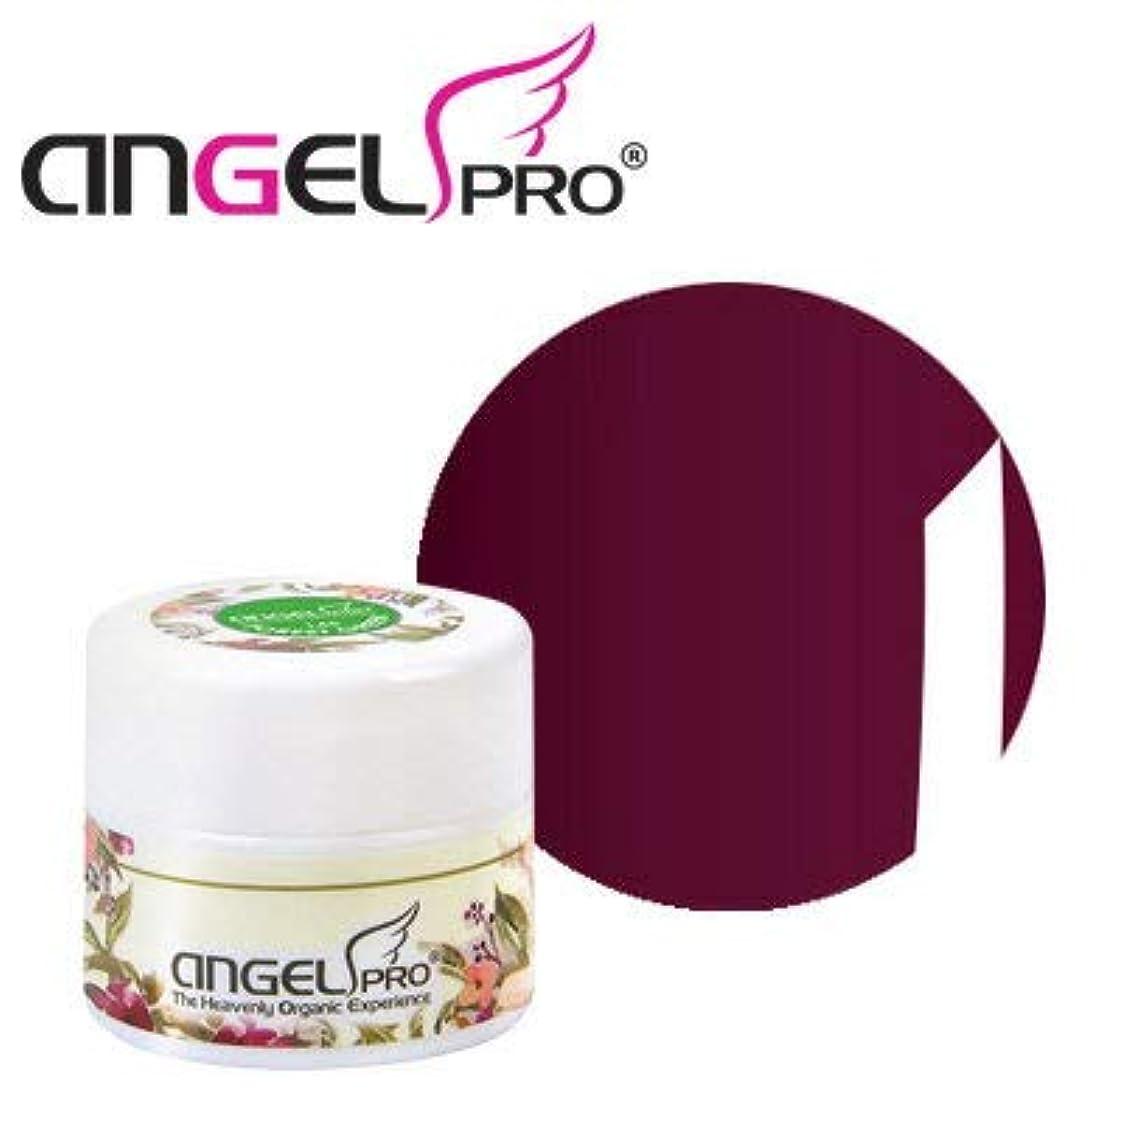 ANGEL PRO ポットジェリー #181 PICKLED BEET 4g